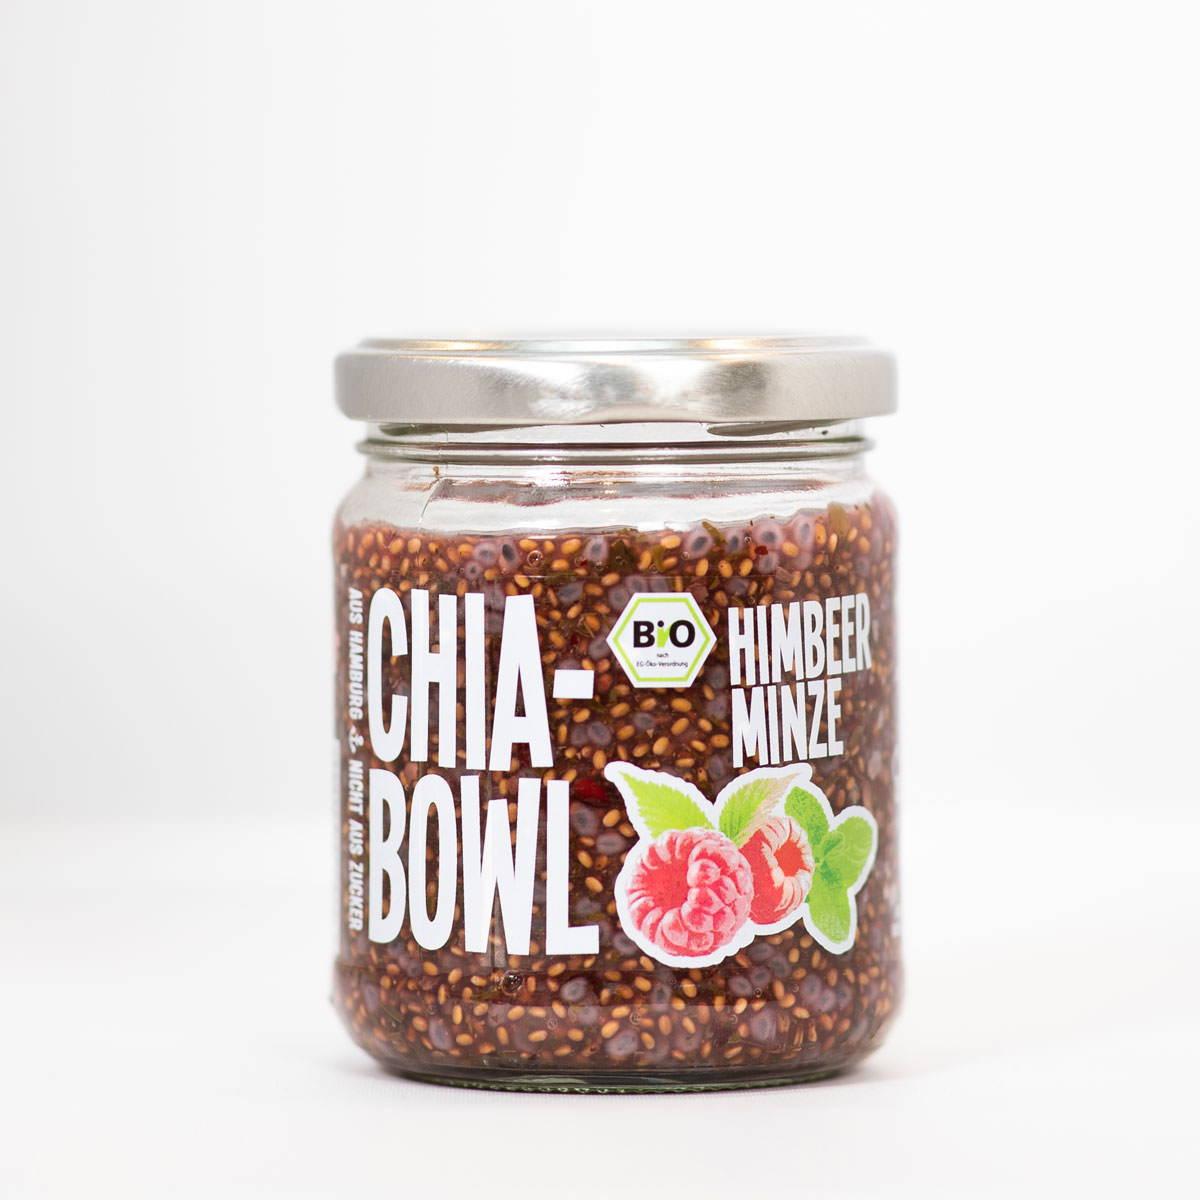 Chia Bowl Himbeer Minze